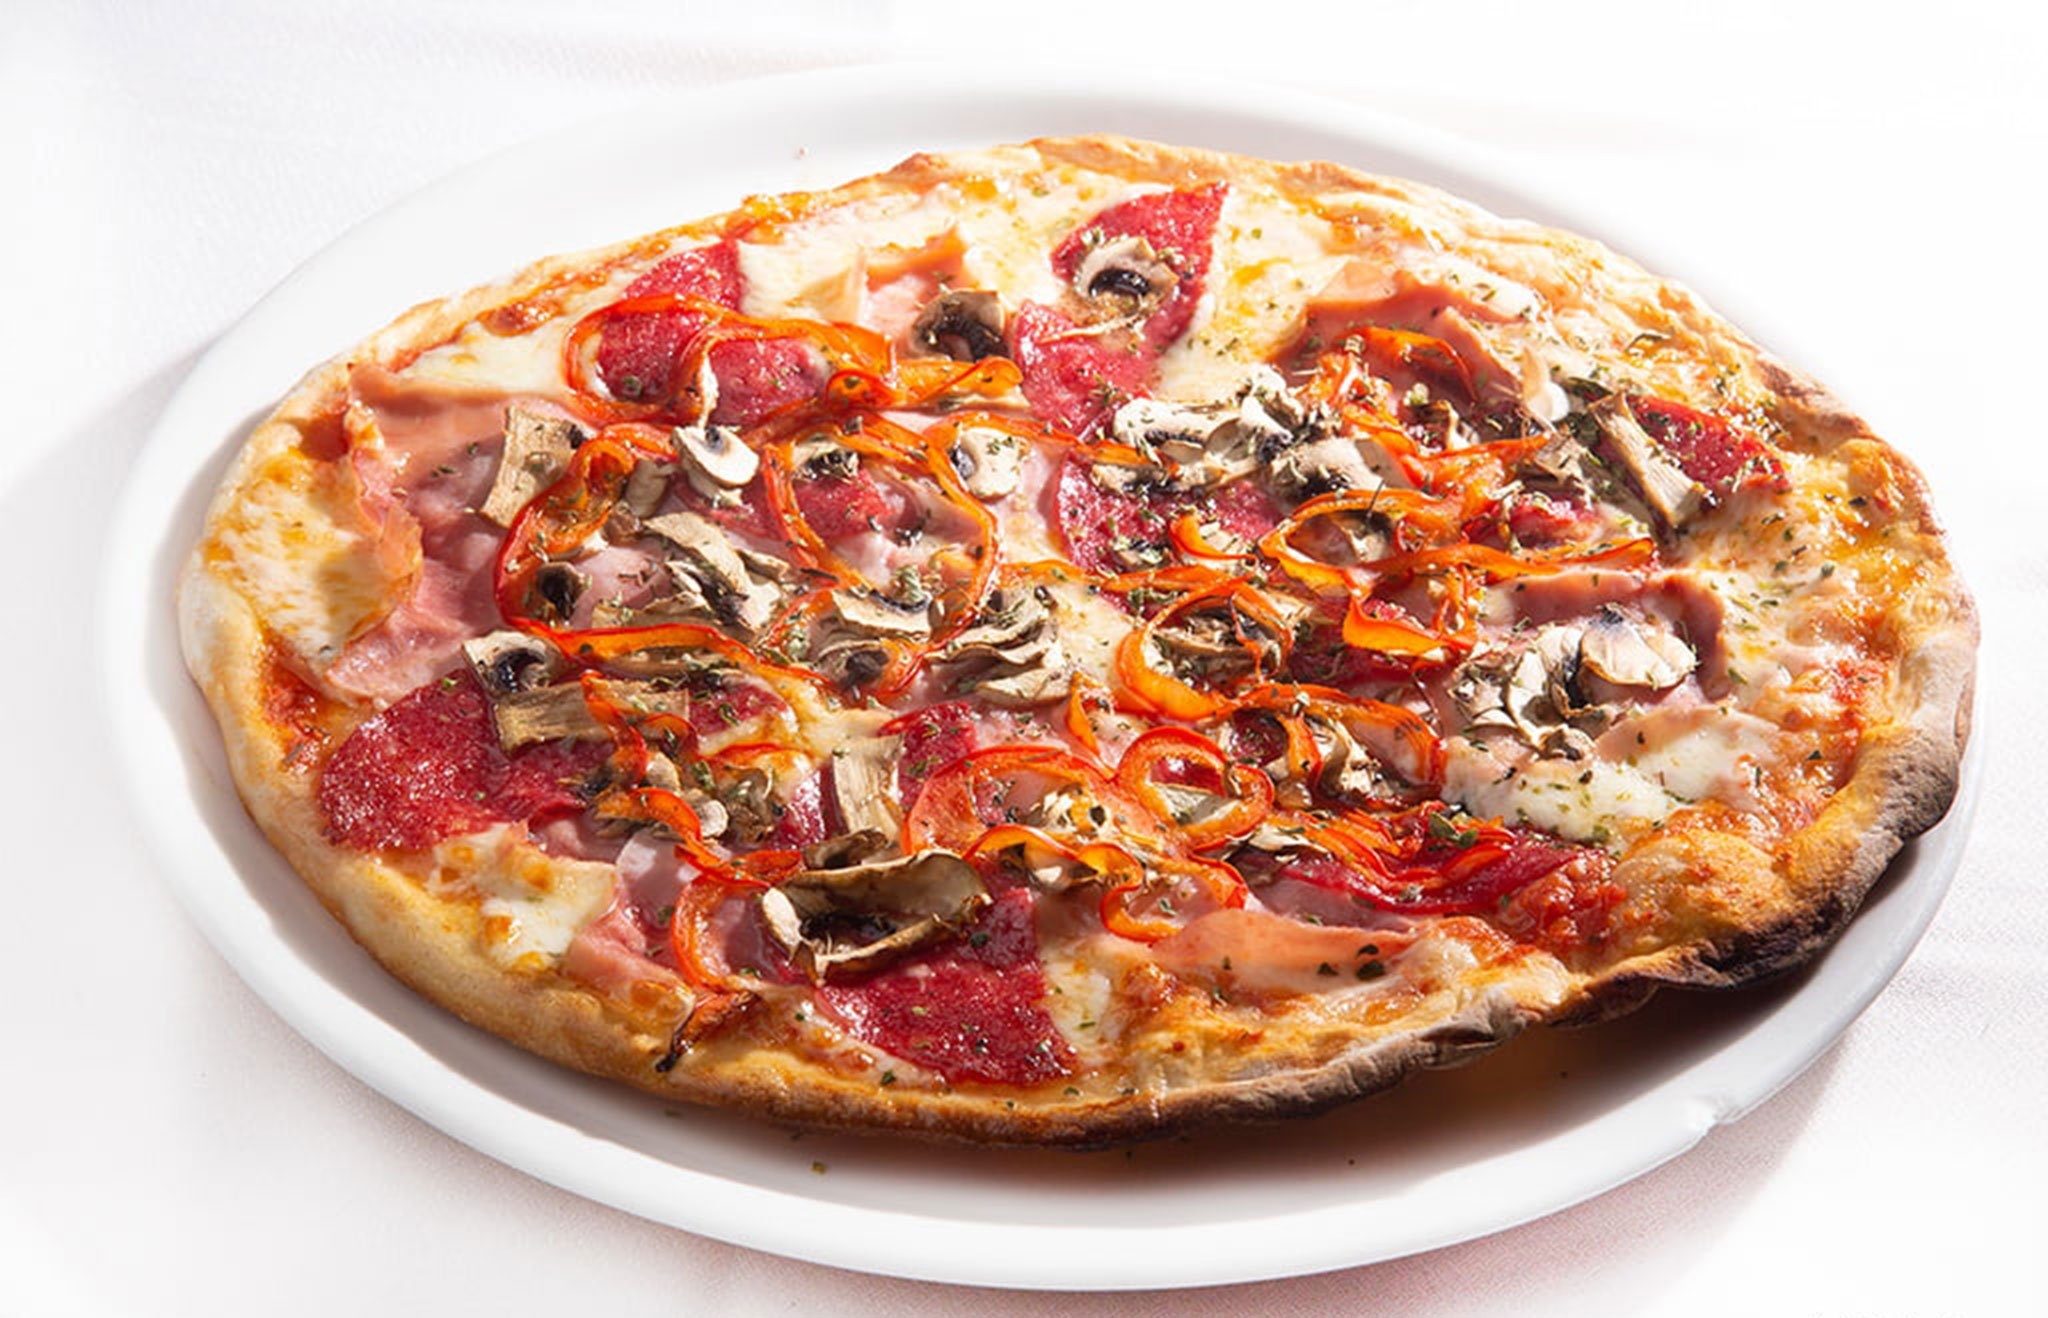 Pizzas to take away in Dénia - Sandunga 52